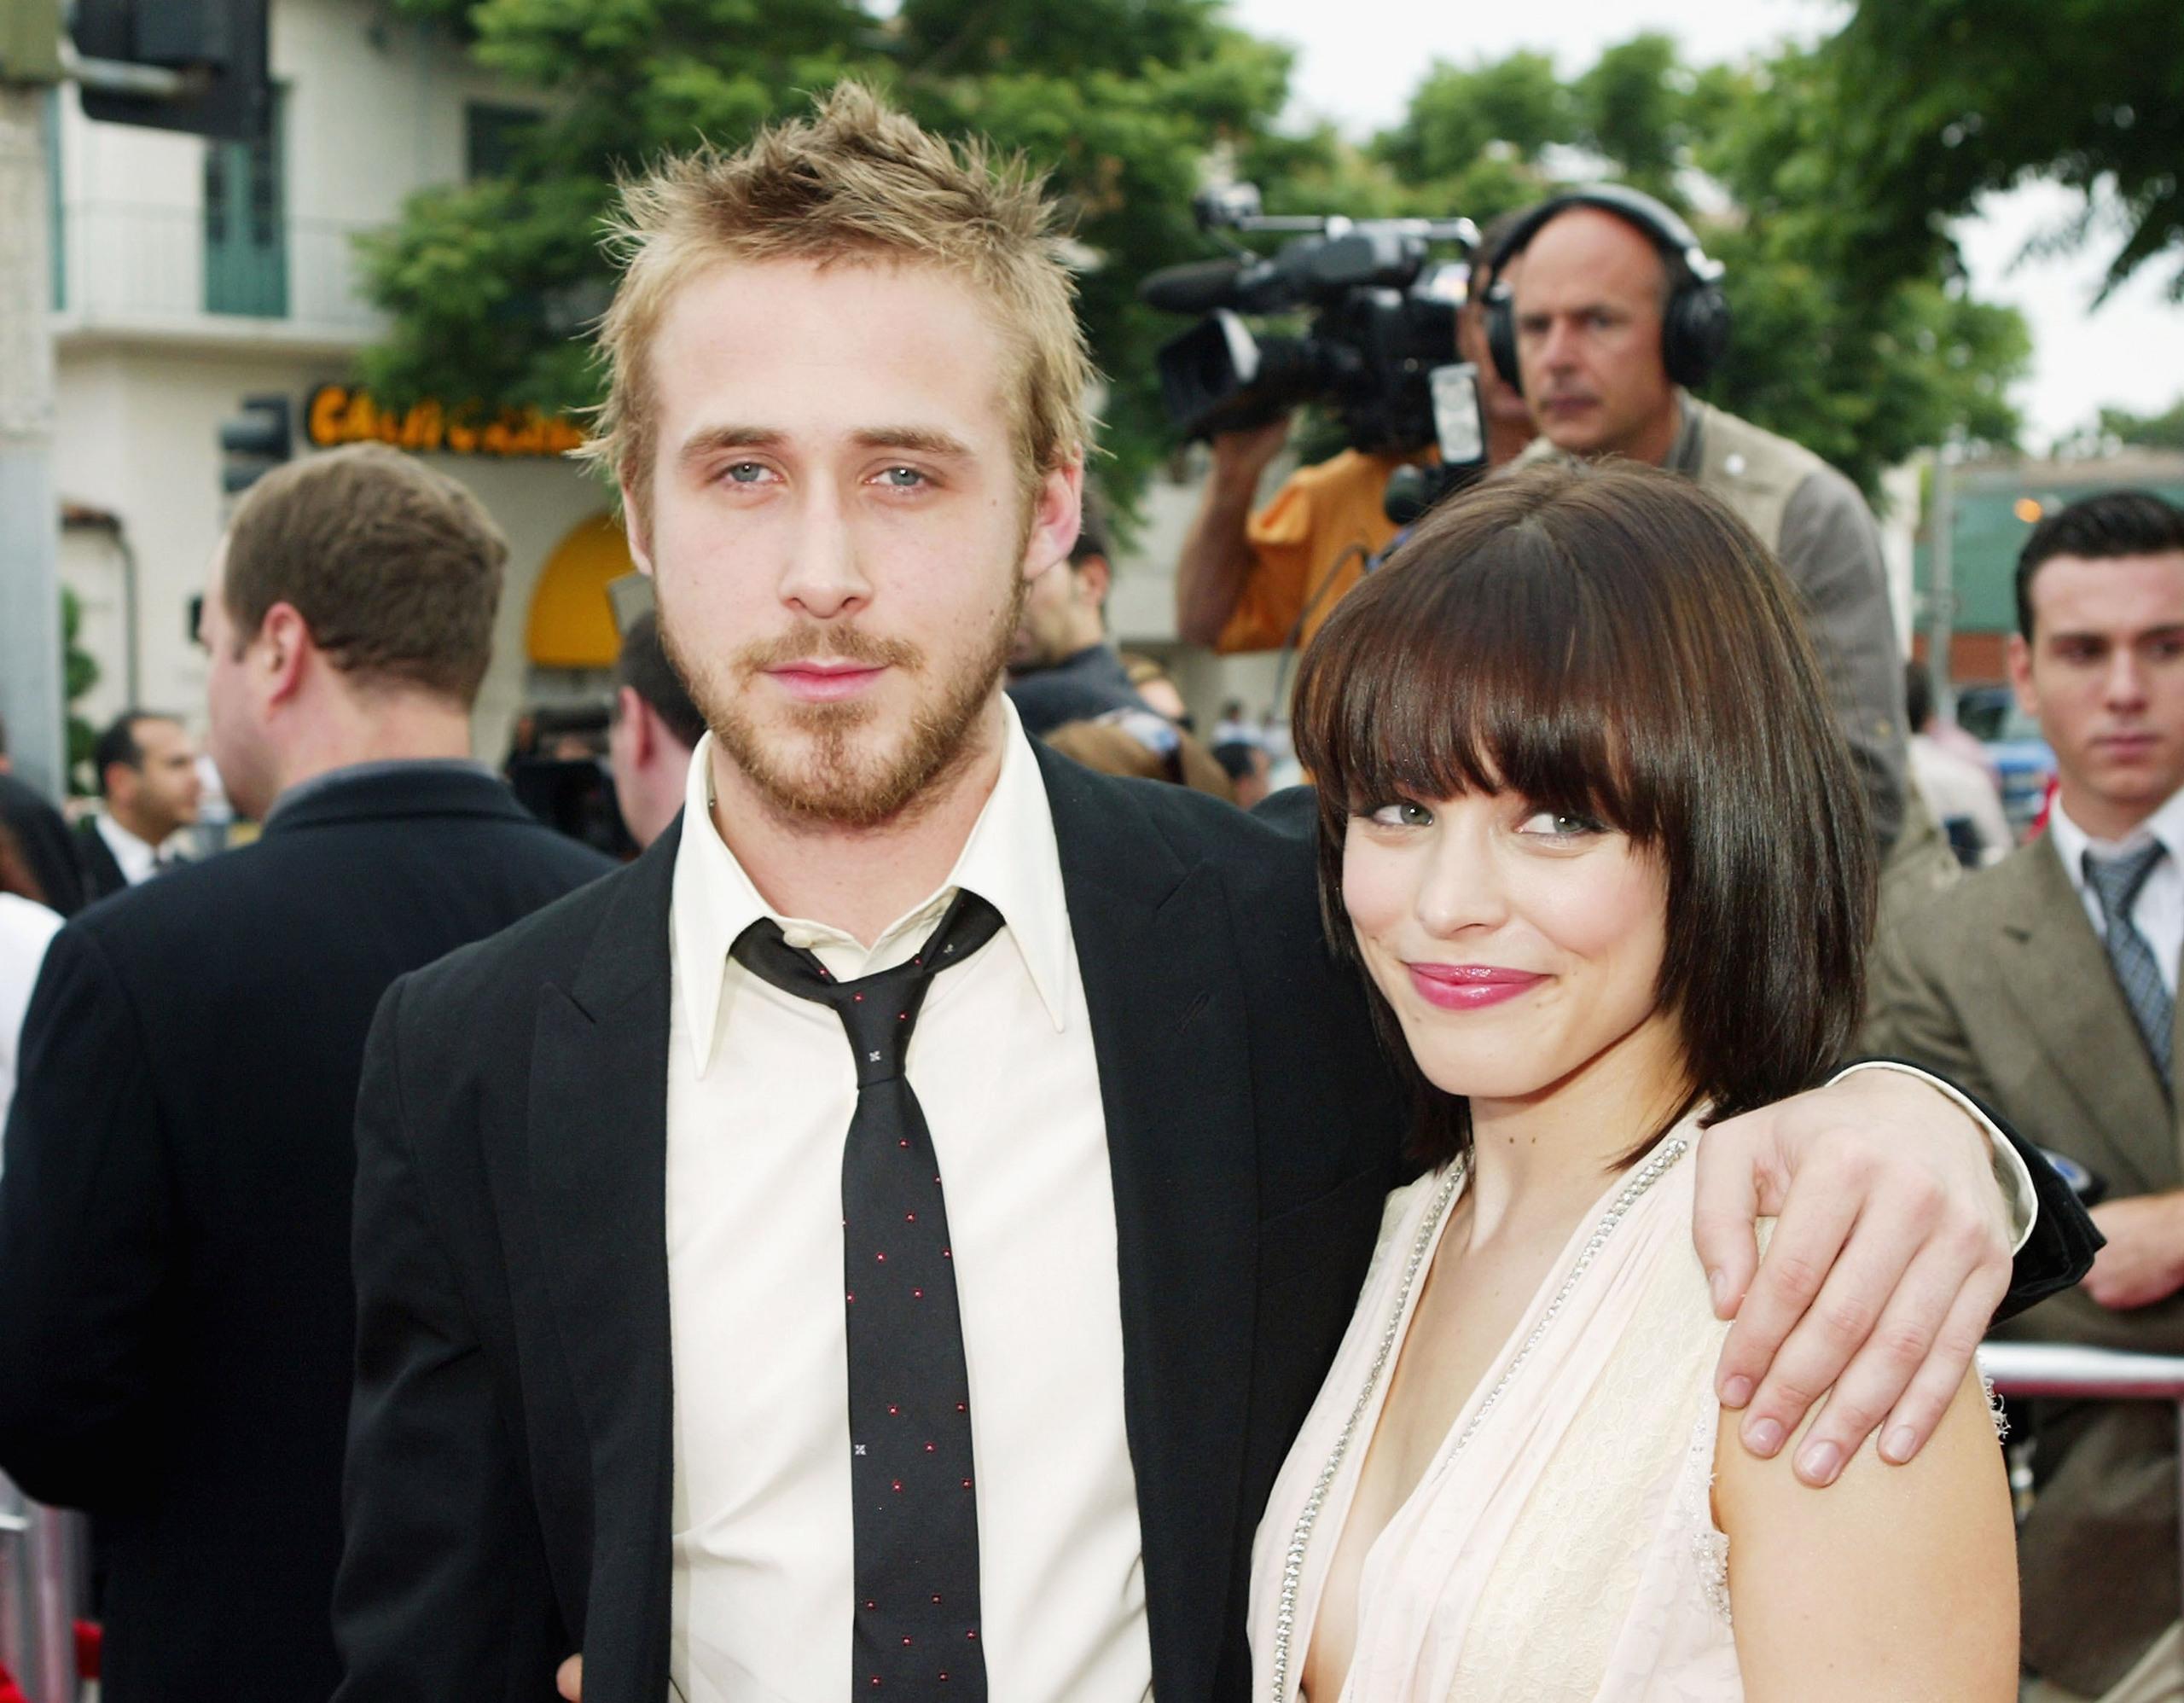 Rachel and Ryan - Rachel McAdams & Ryan Gosling Photo (1445346